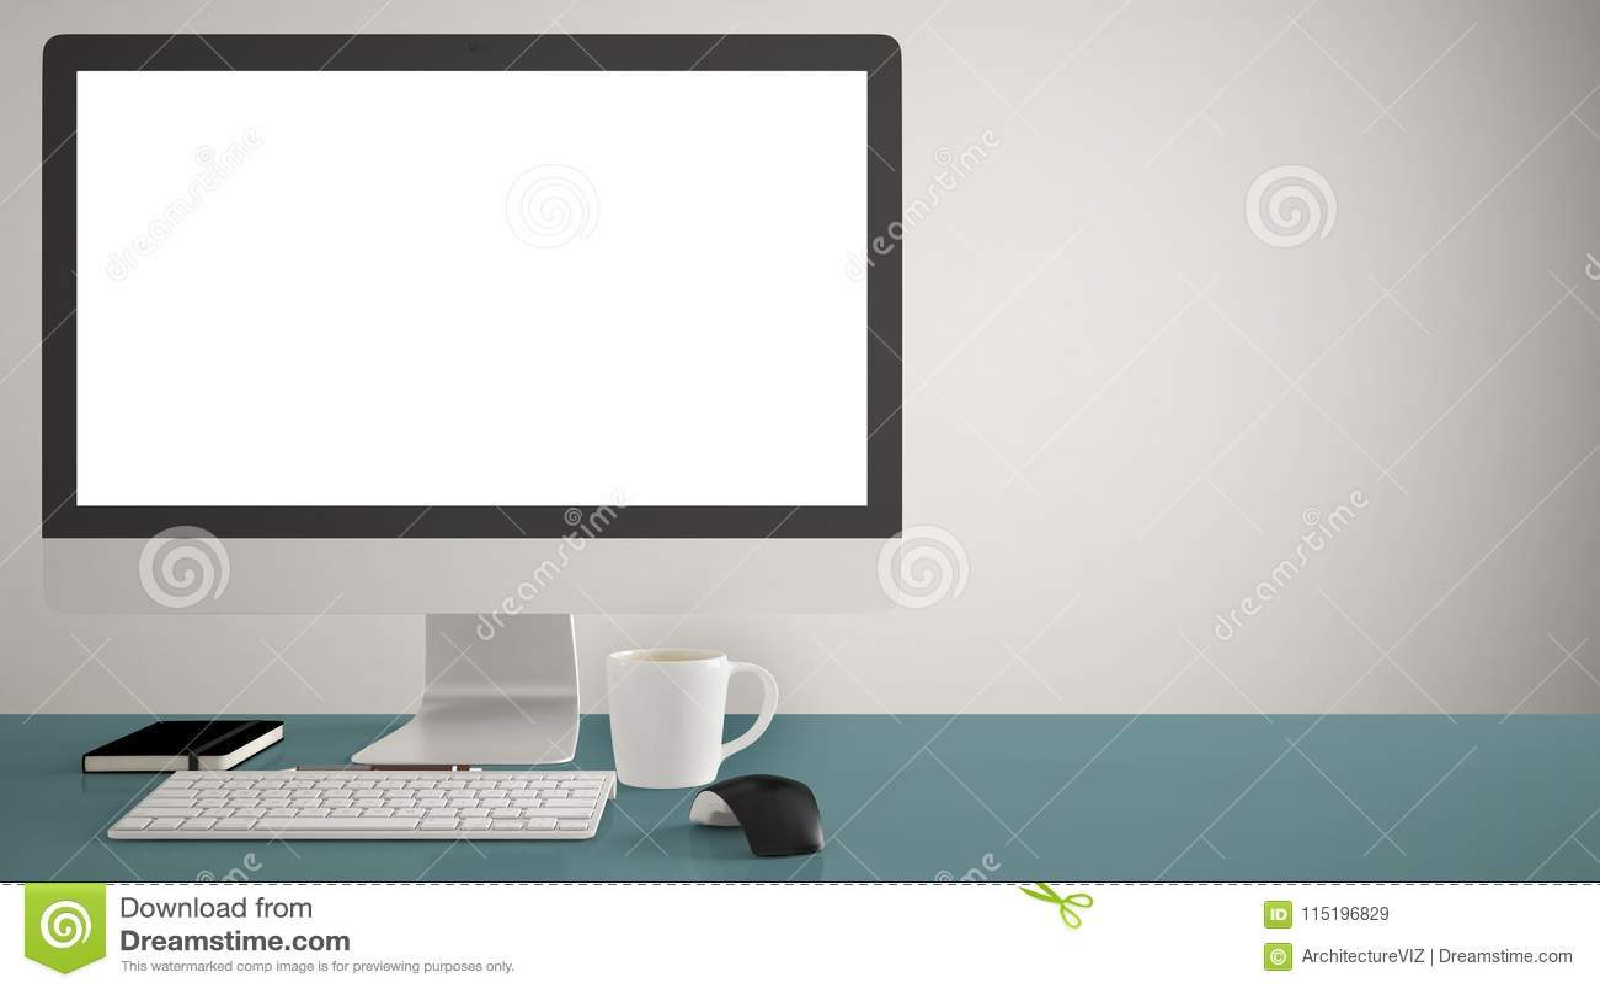 Desktop Mockup Template Computer On Blue Pantone Colored